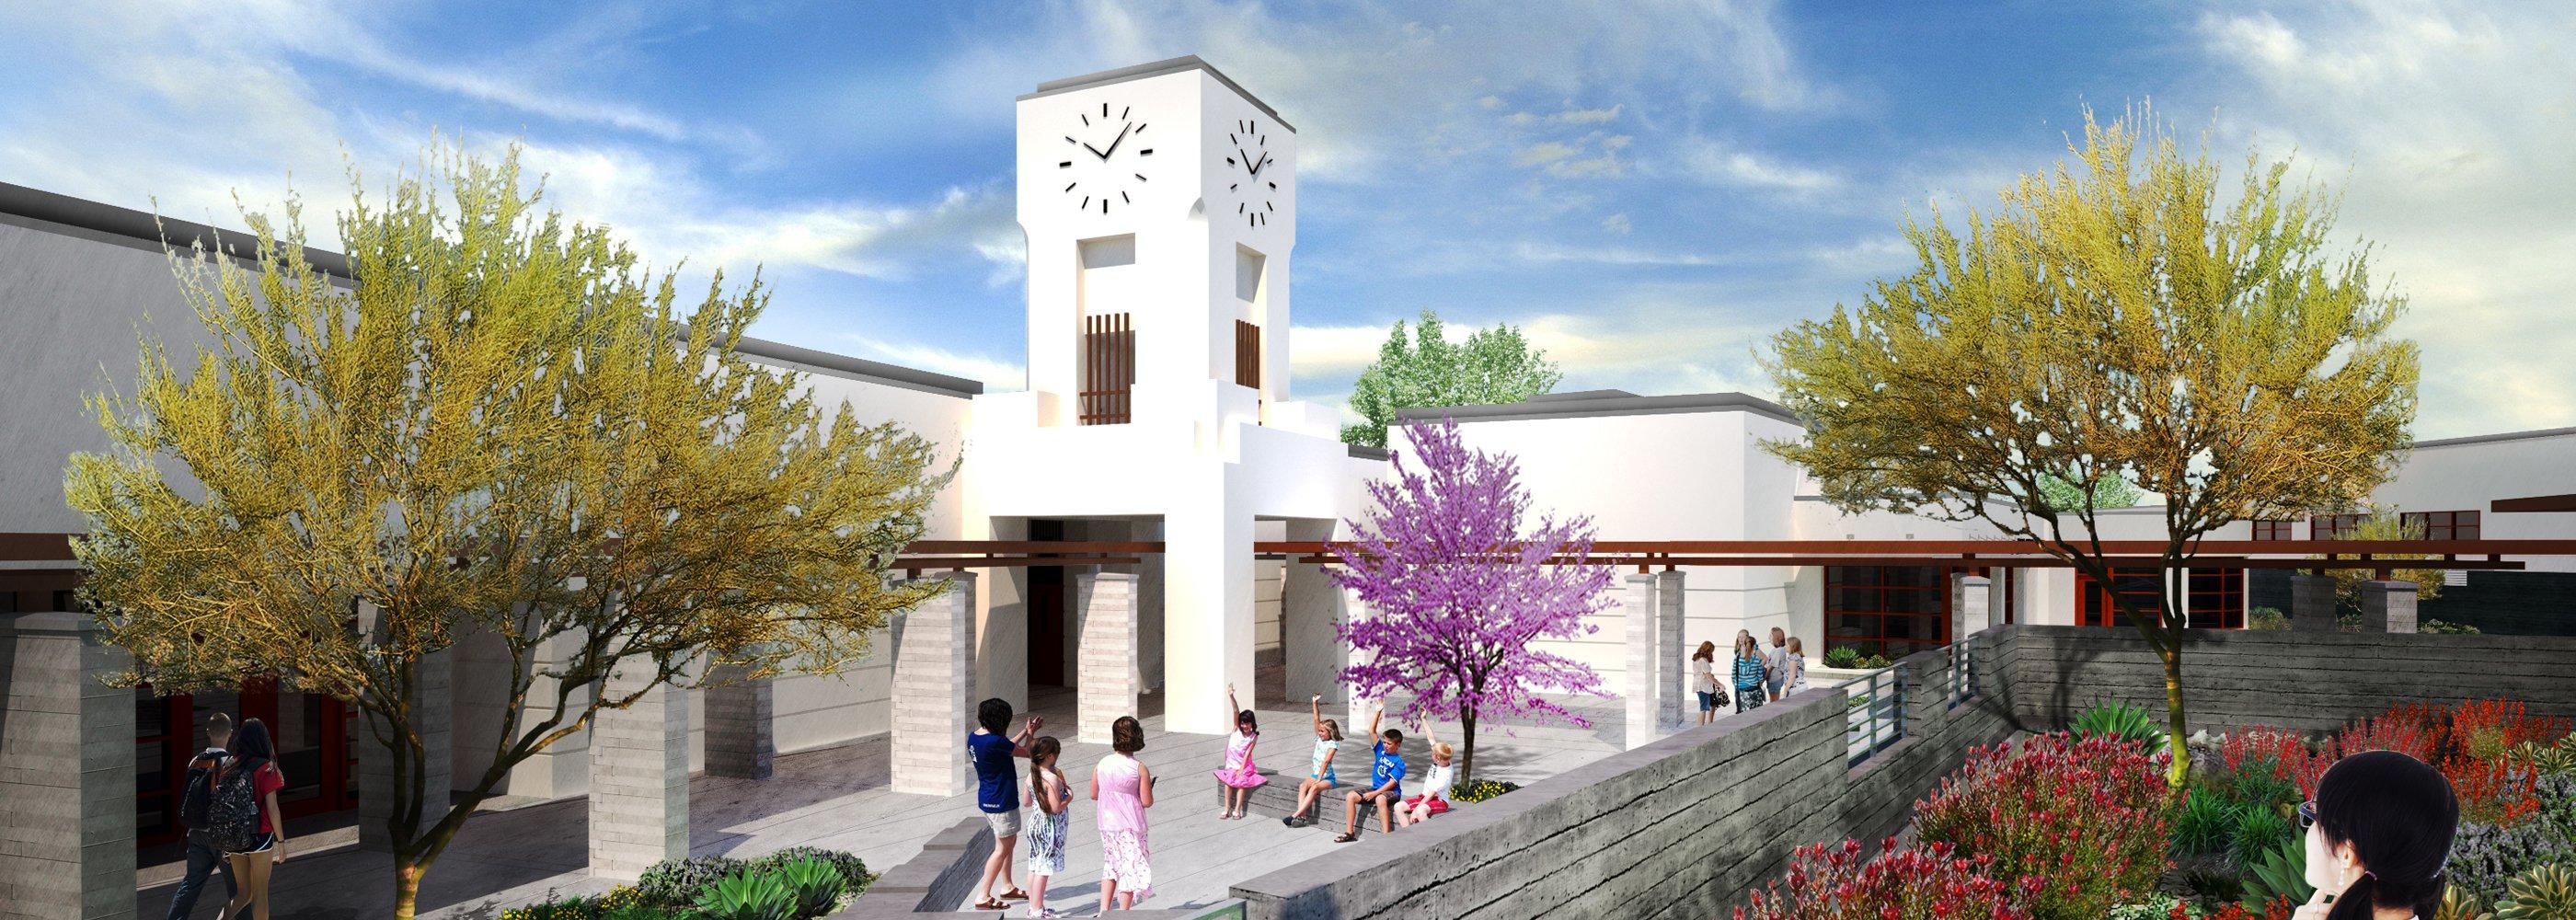 cadence park school rendering